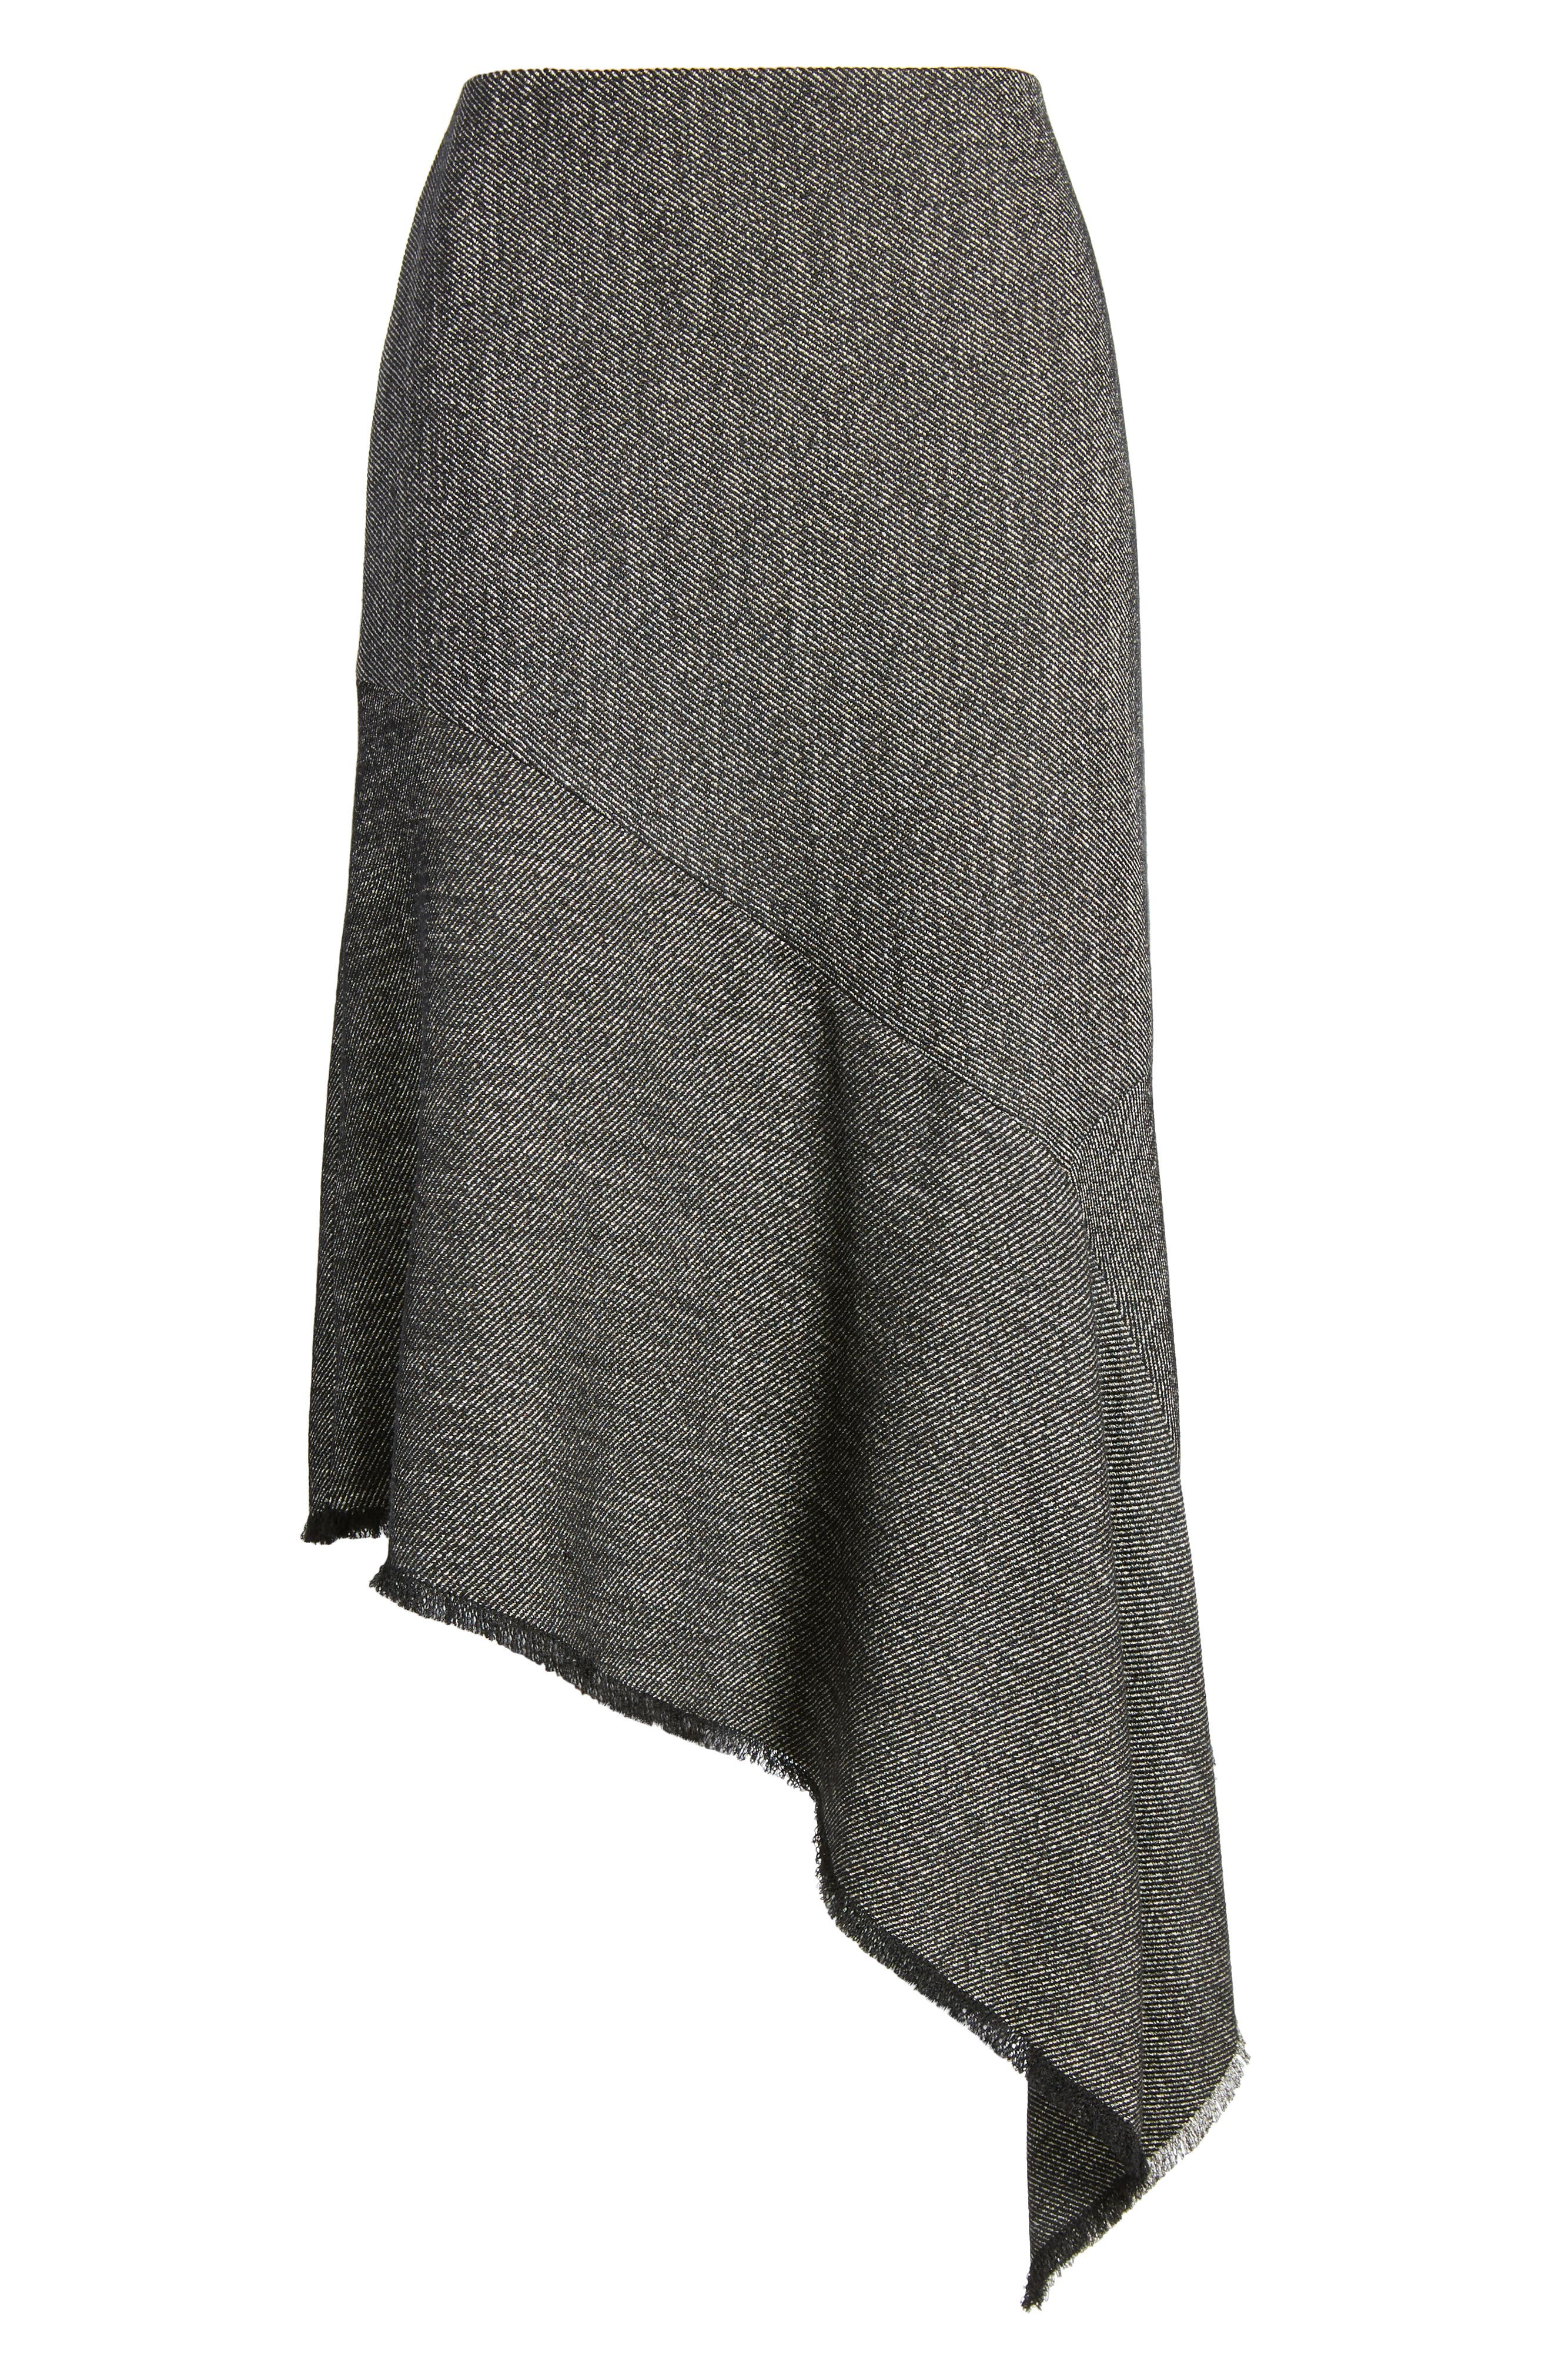 Asymmetrical Tweed Skirt,                             Alternate thumbnail 6, color,                             001